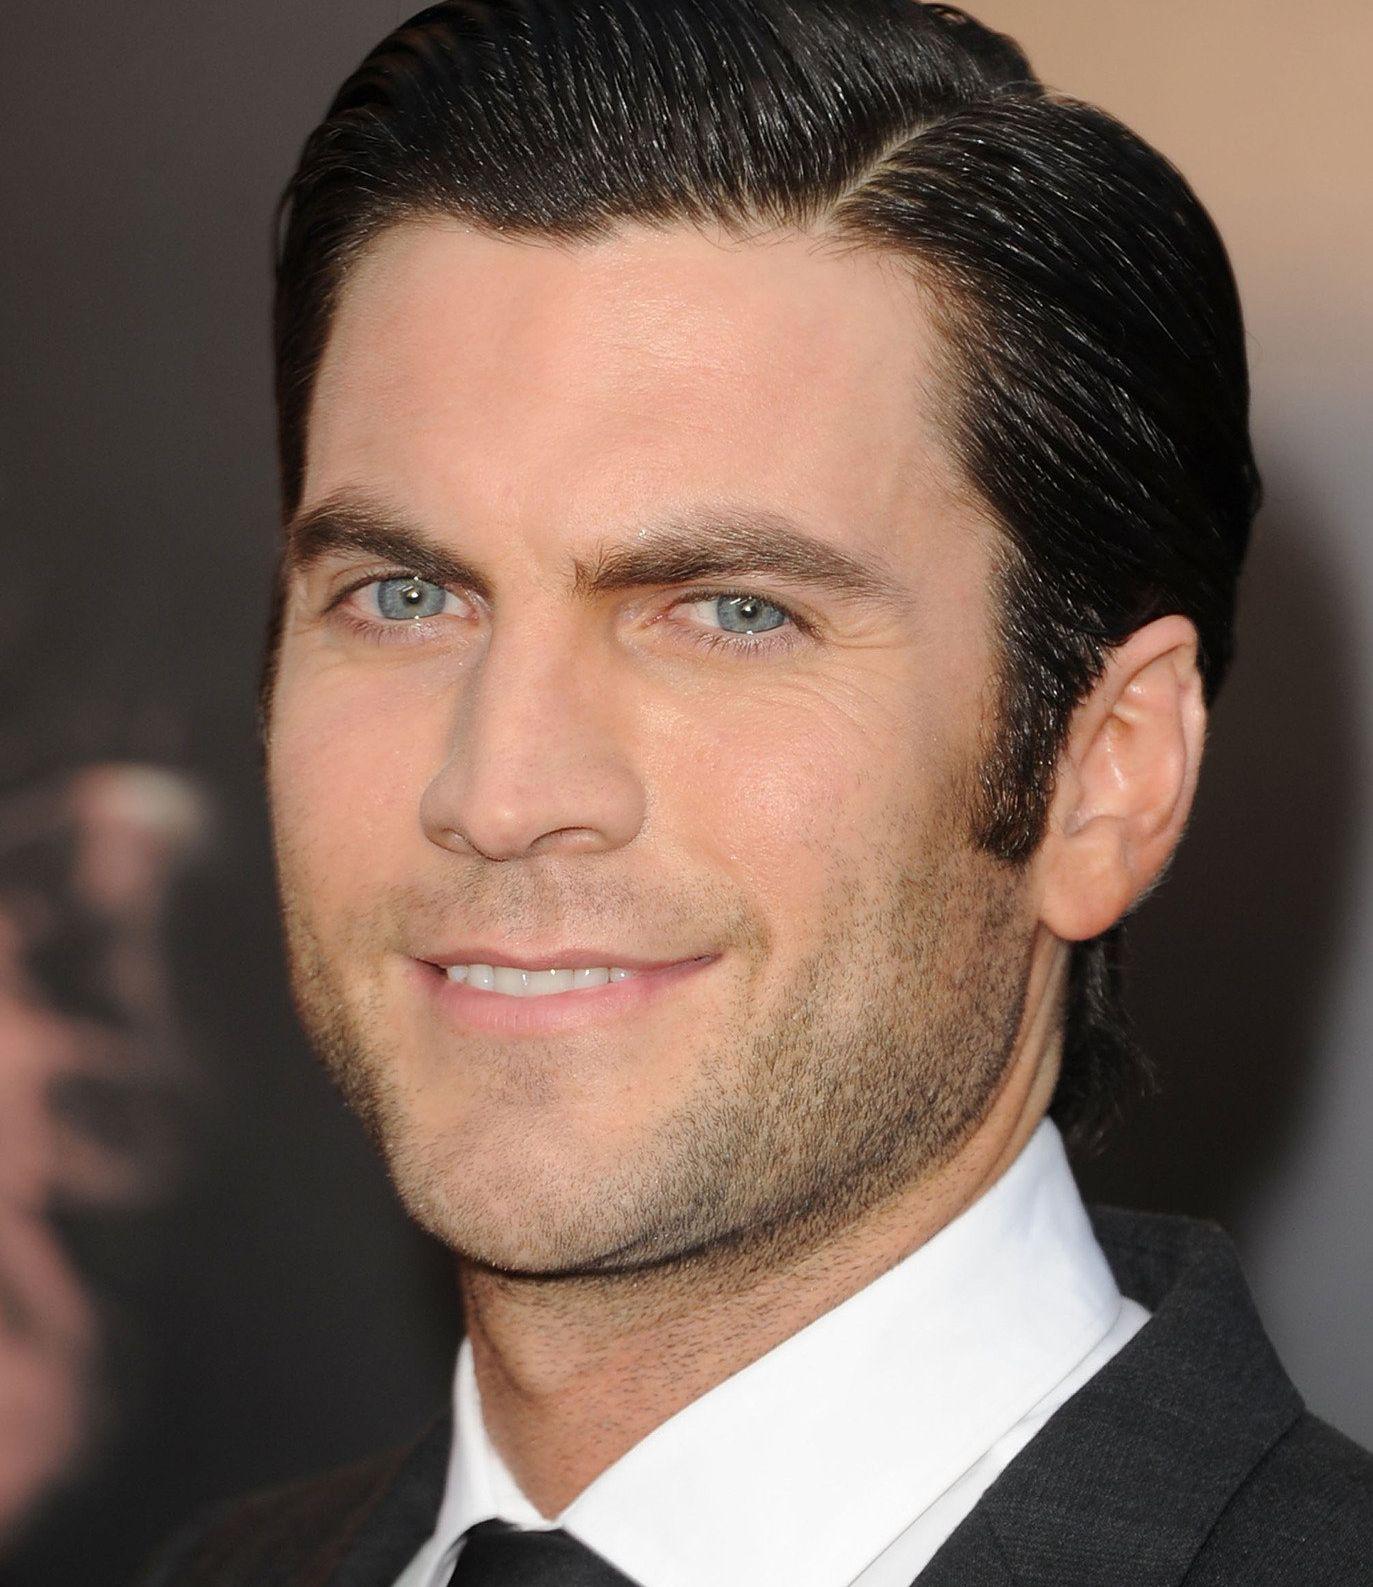 Men haircuts names ahs freakshowu announces another cast member  ahs and